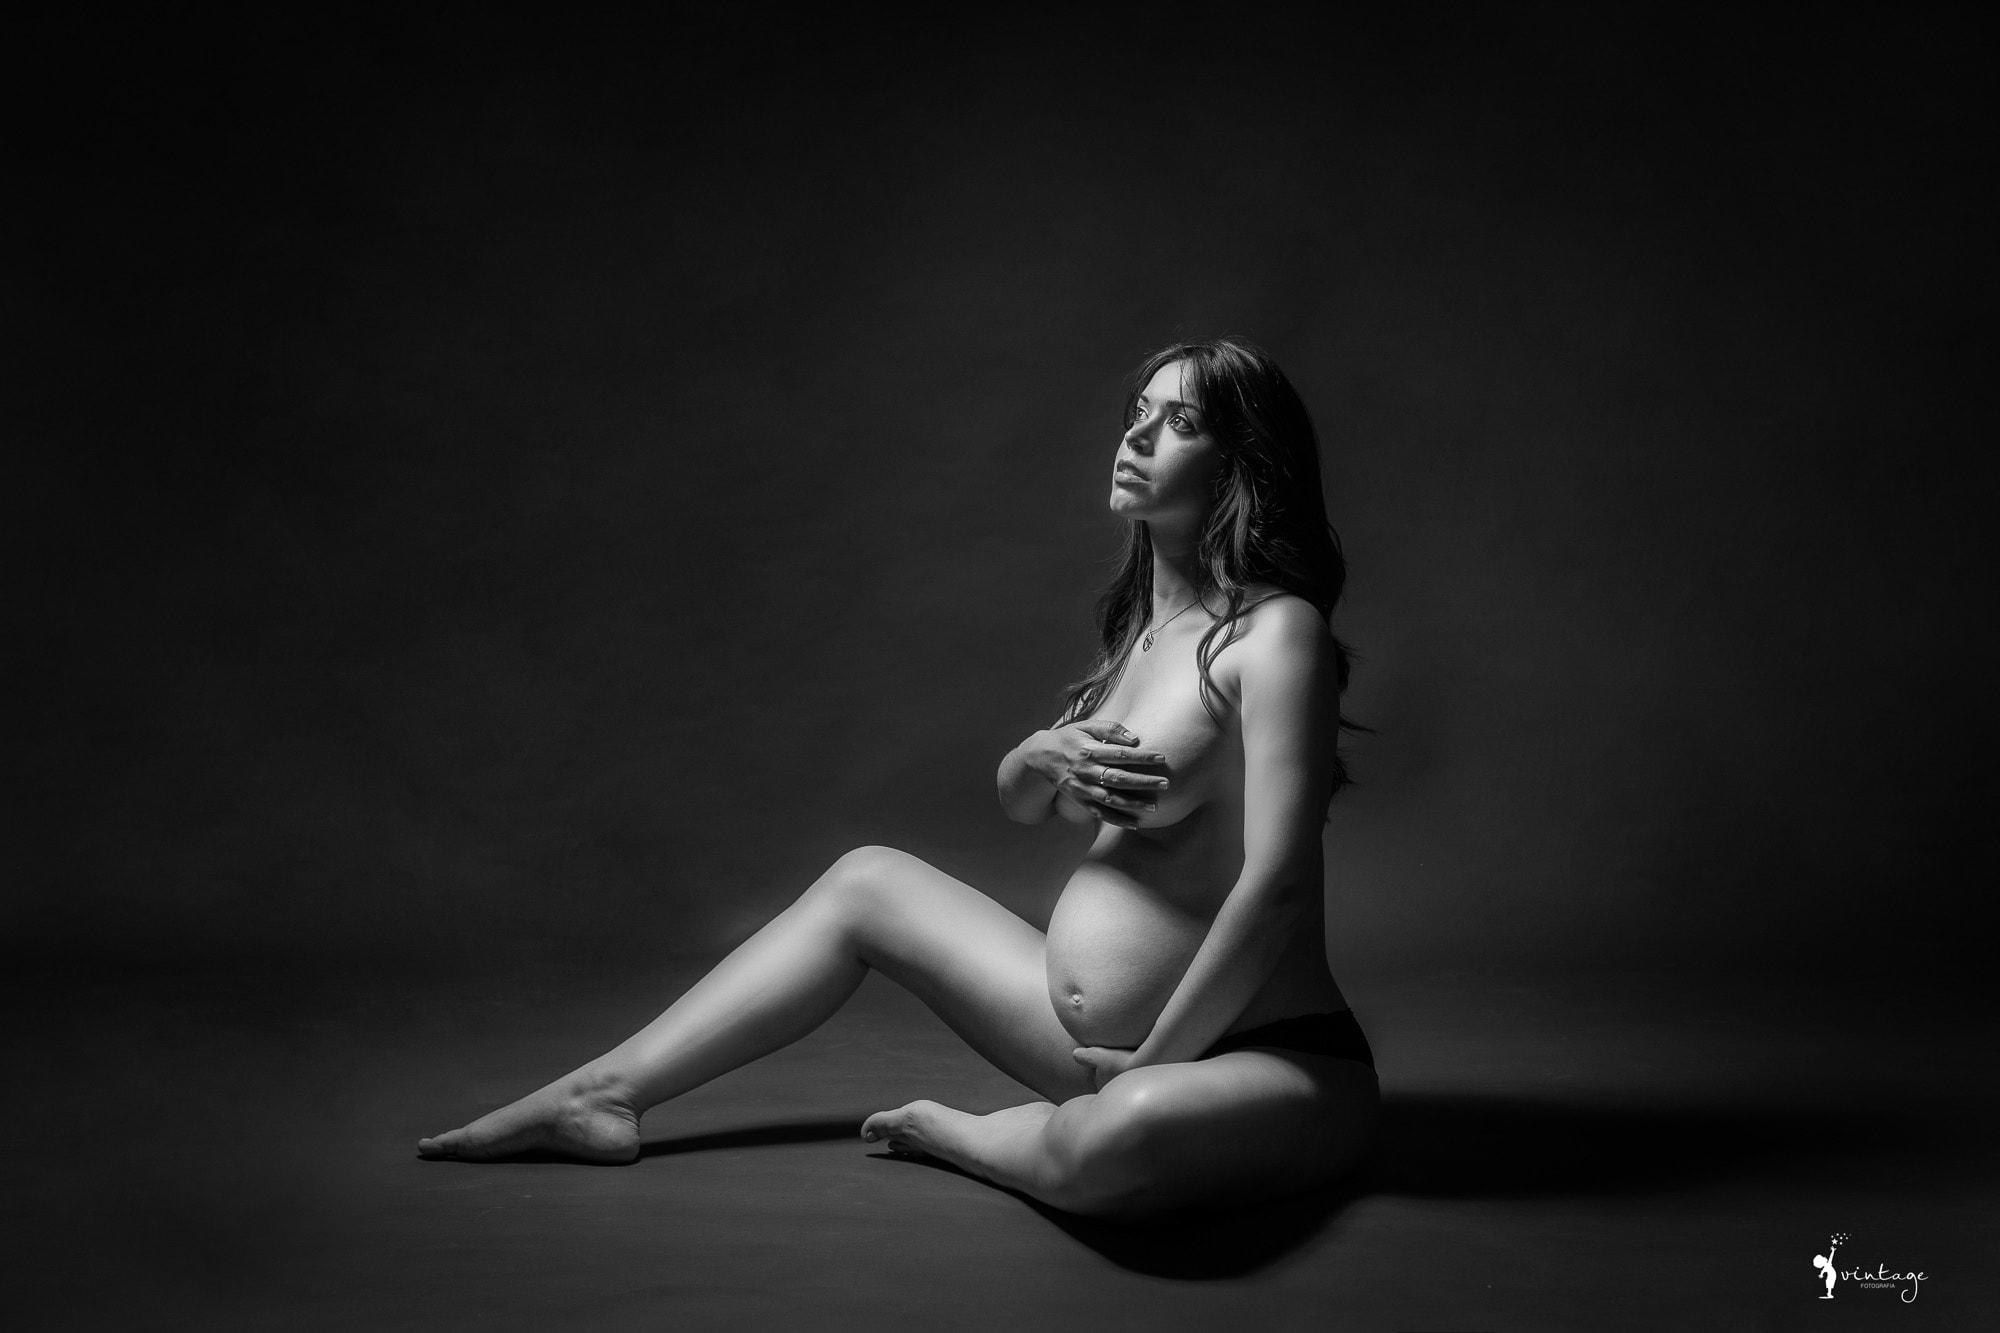 fotografia sesion maternidad valencia book embarazo embarazada vintage fotografia toni lara